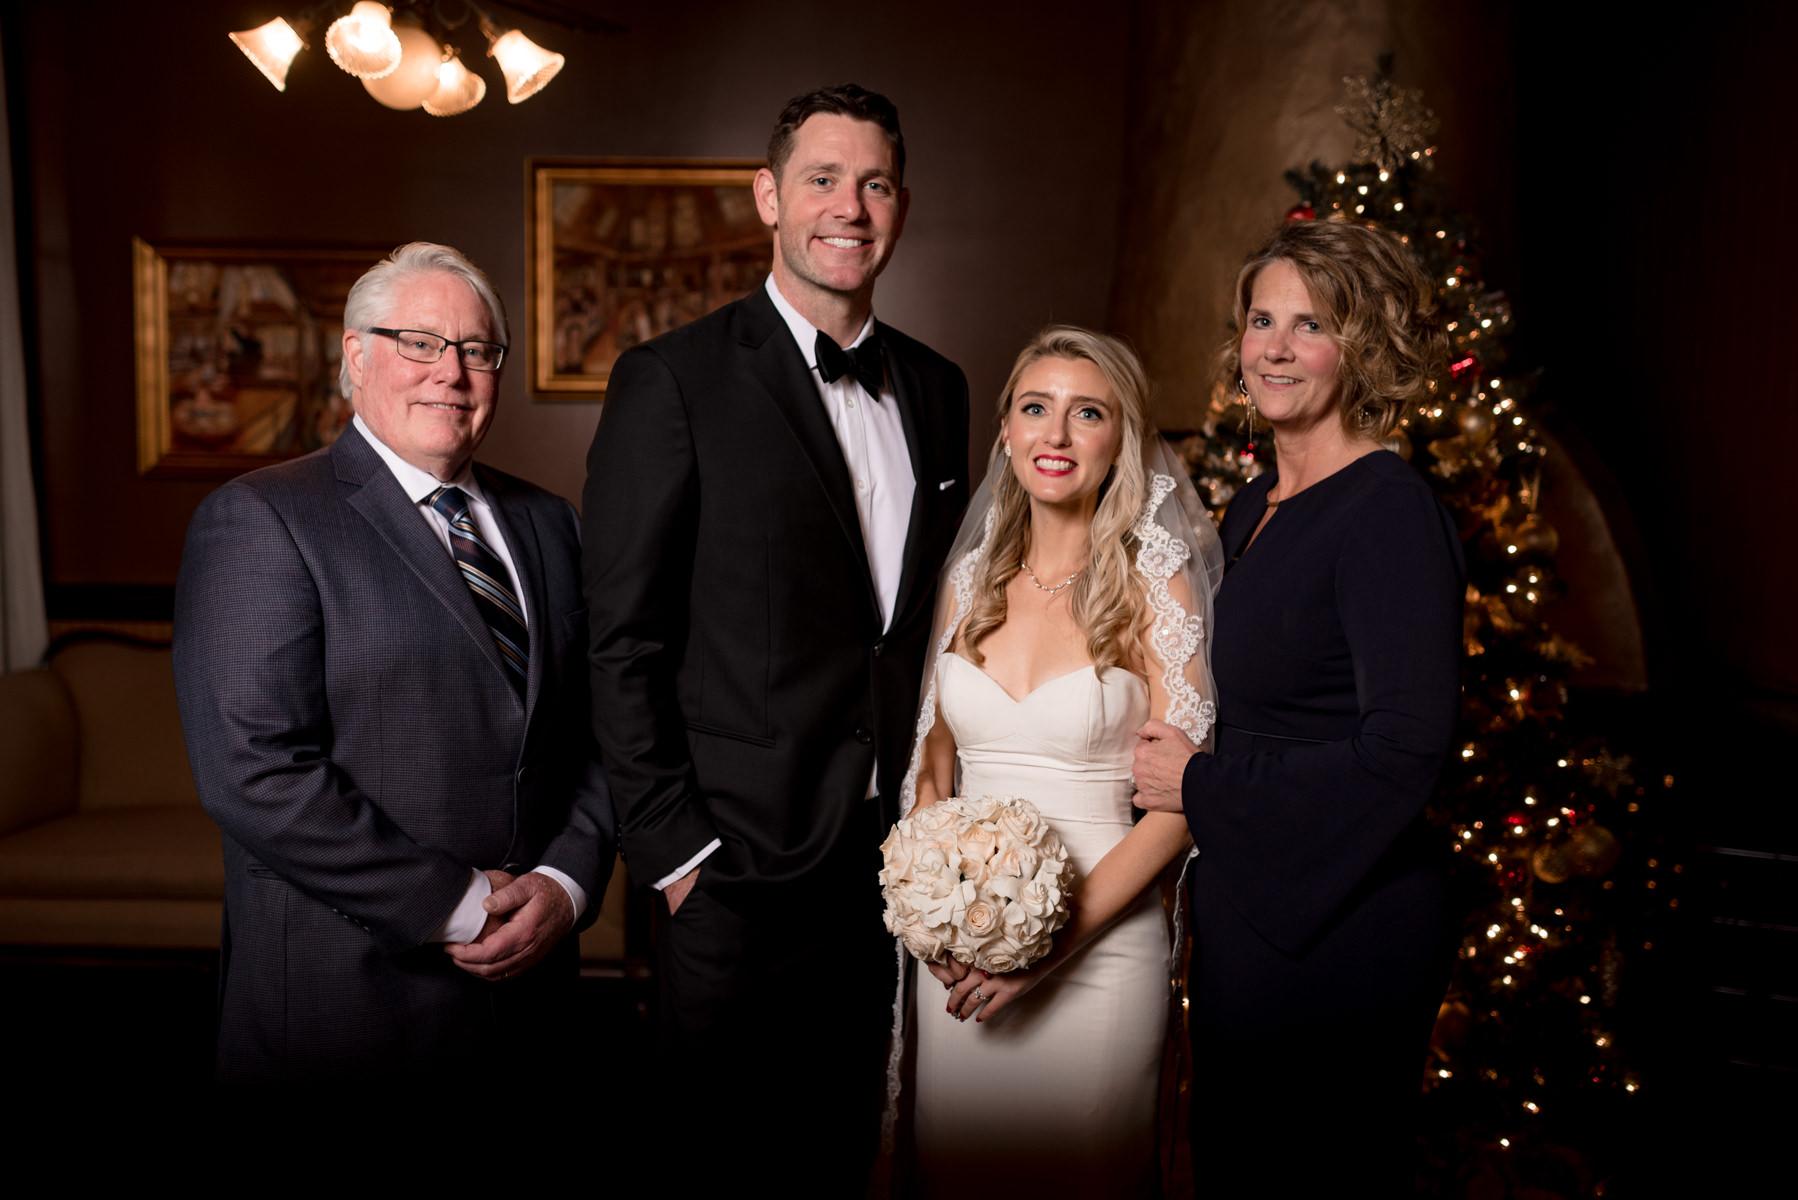 Andrew Tat - Documentary Wedding Photography - Lake Union Cafe - Seattle, Washington -Rachel and Ryan - 25.jpg